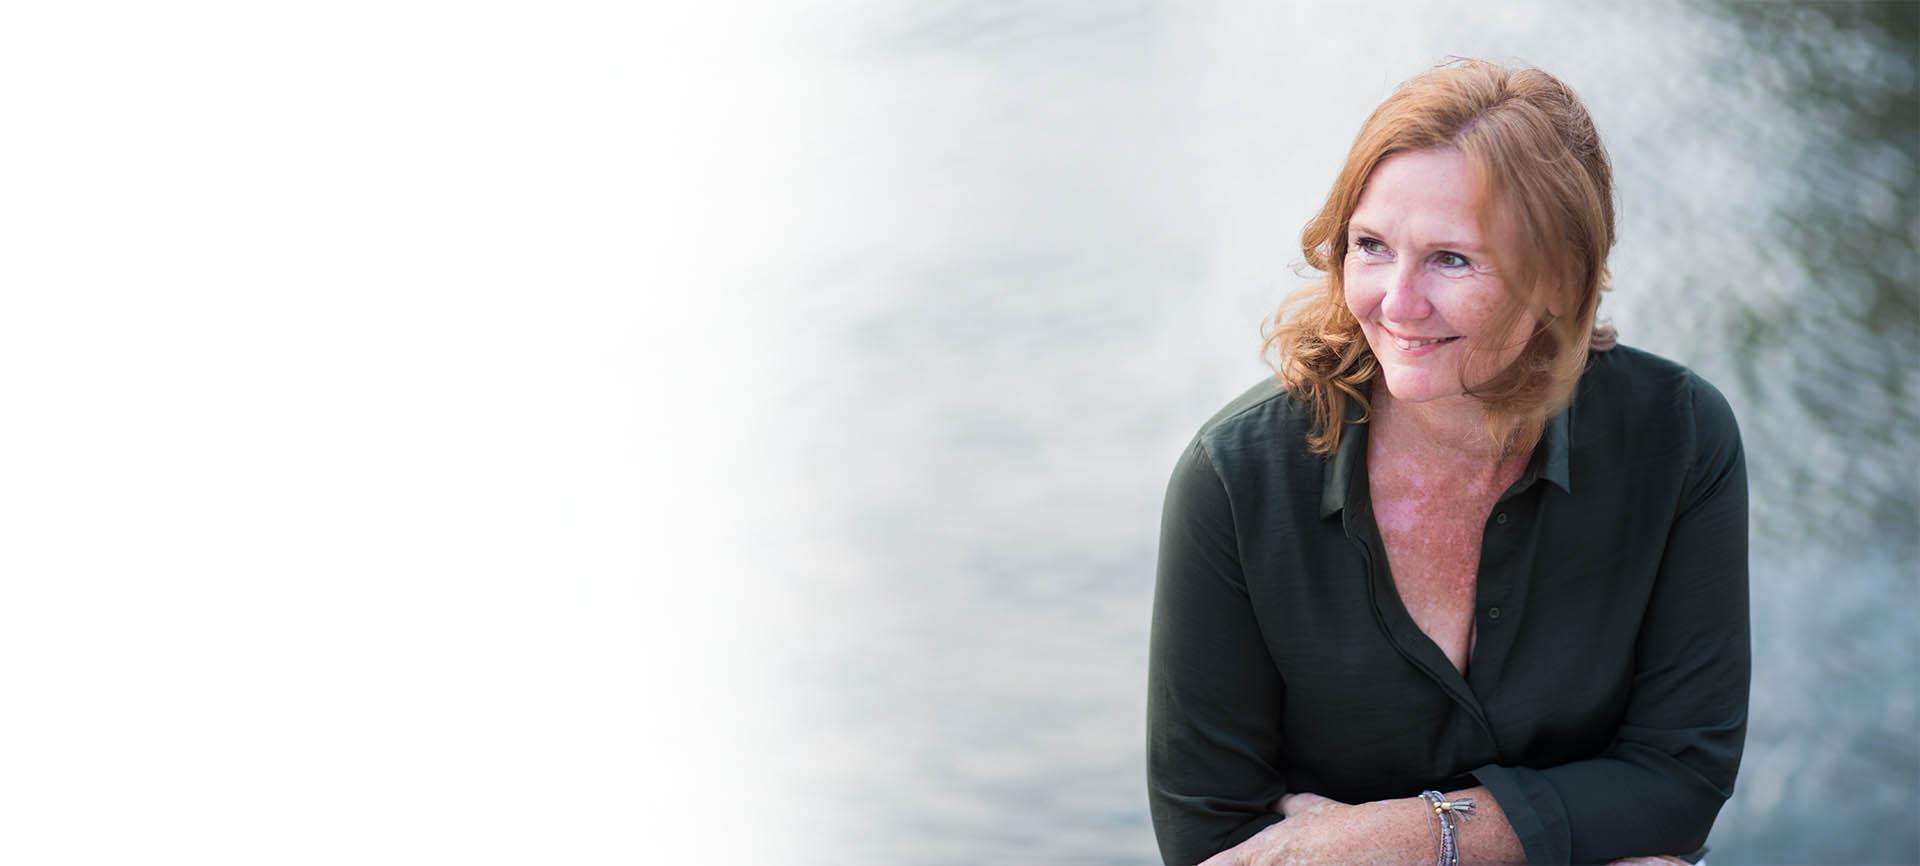 Petra Olenyi Coaching Portrait am Wasser